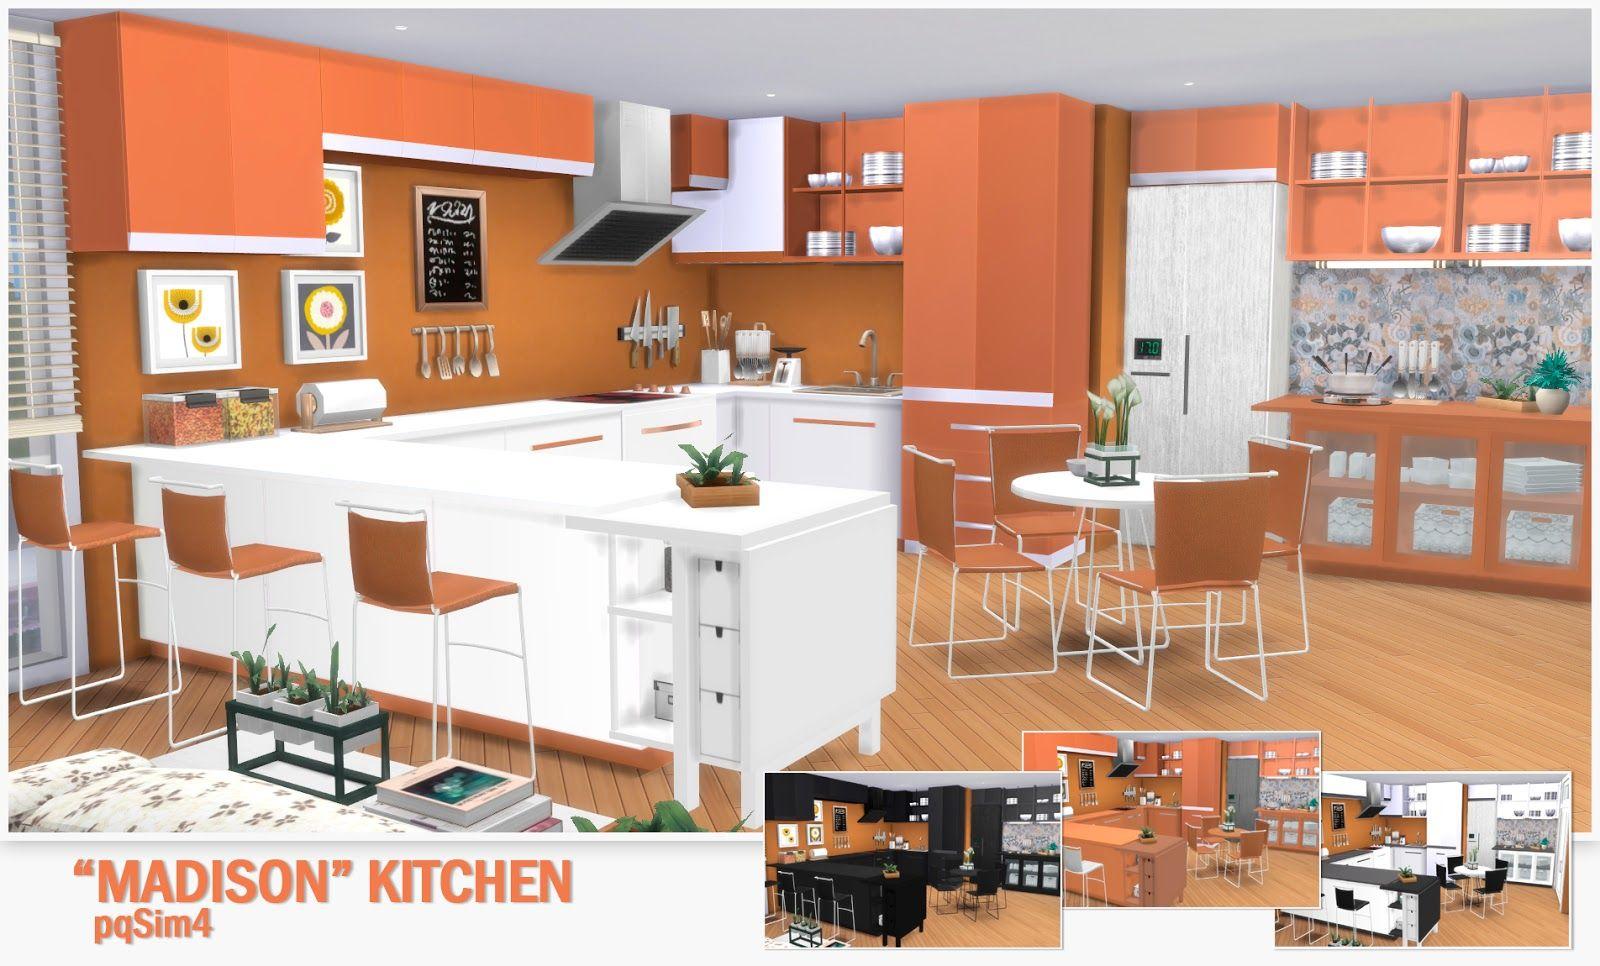 The Sims 4 Cc Madison Kitchen Set The Sims Cc Pinterest